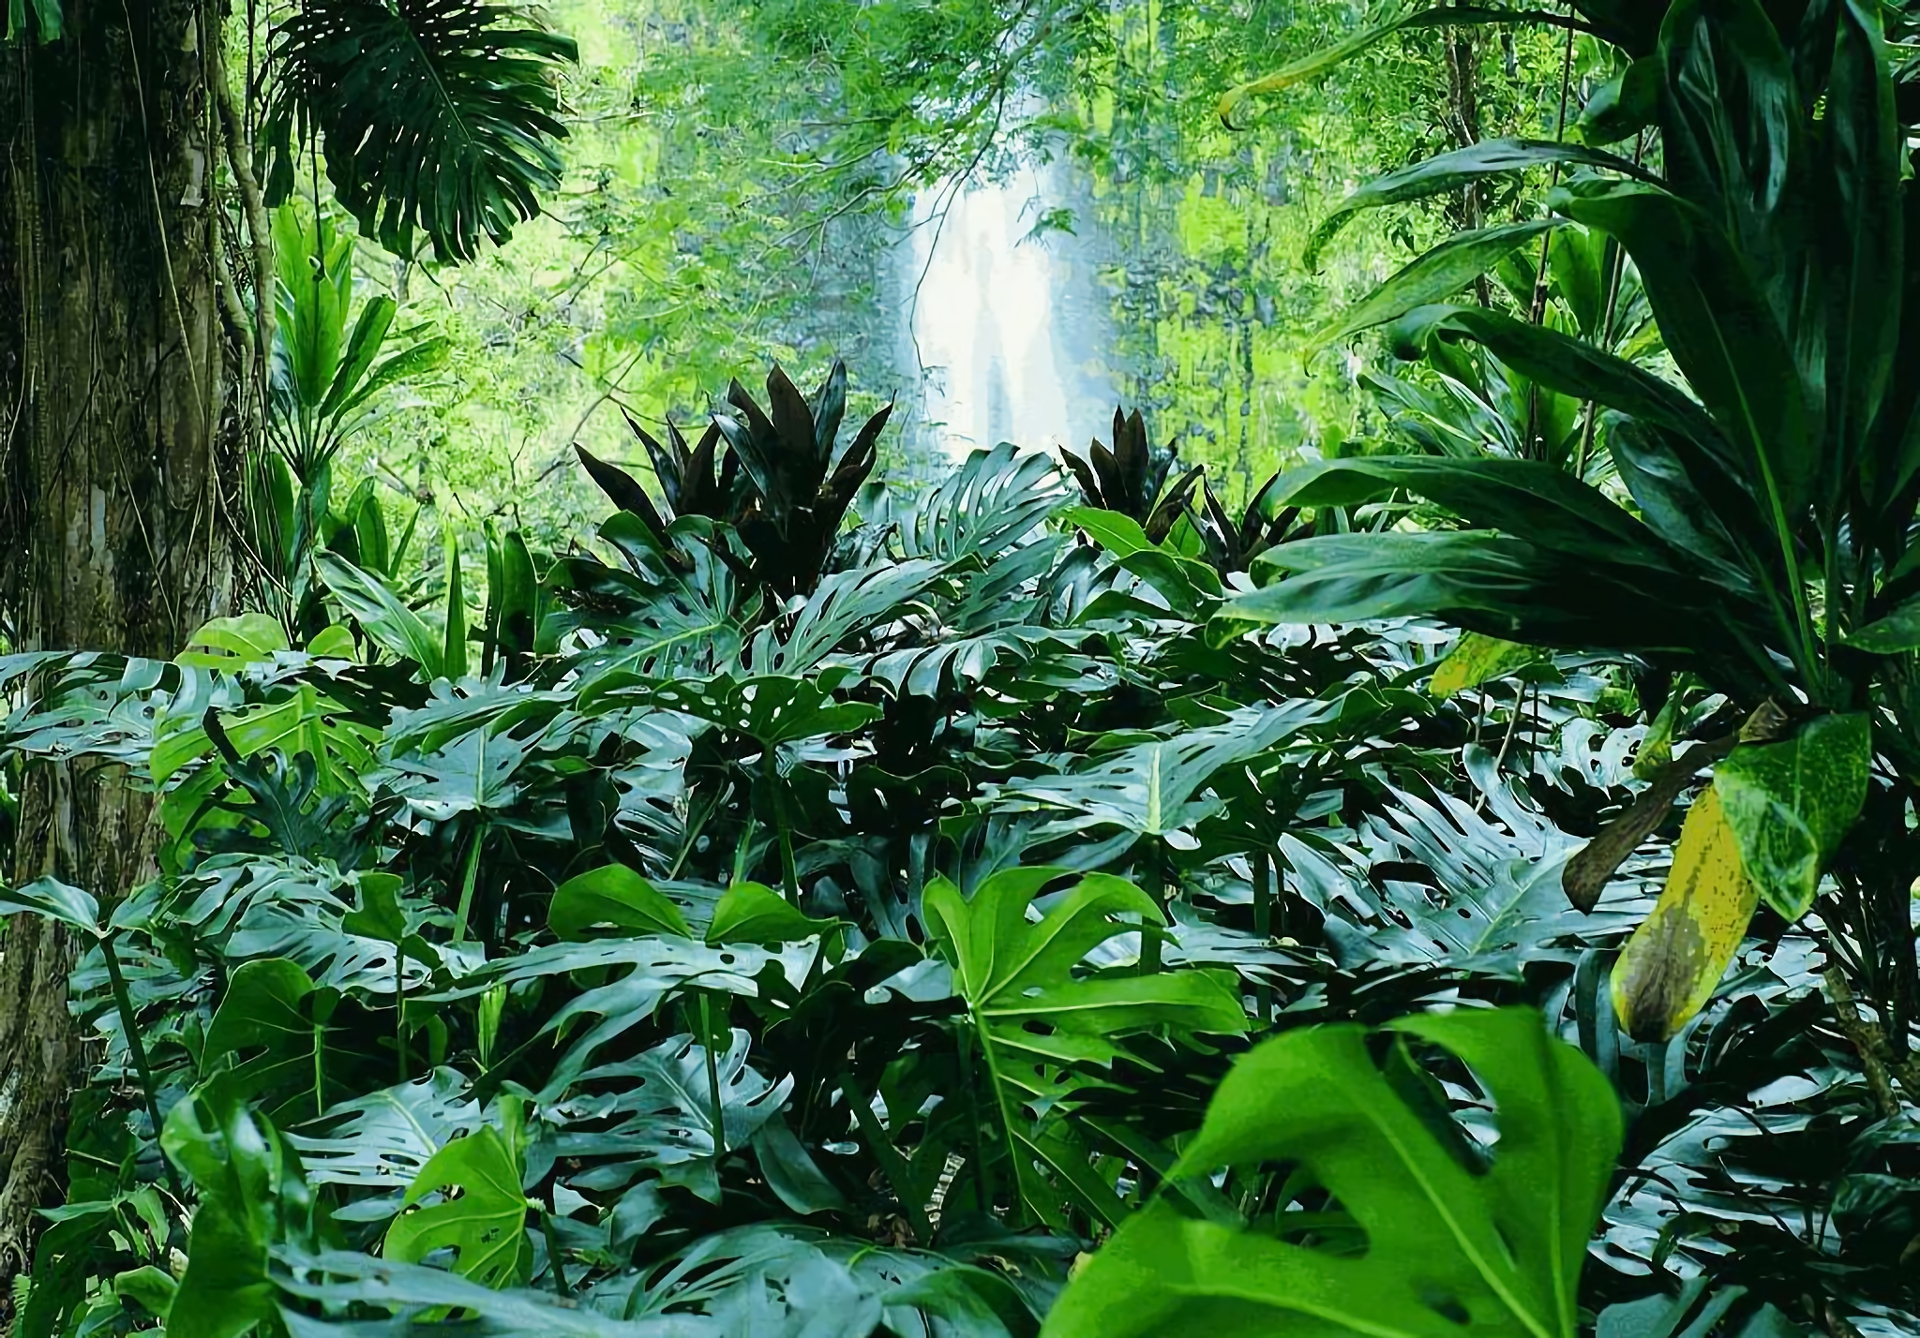 Waterfall In Tropical Forest Fondo De Pantalla Hd Fondo De